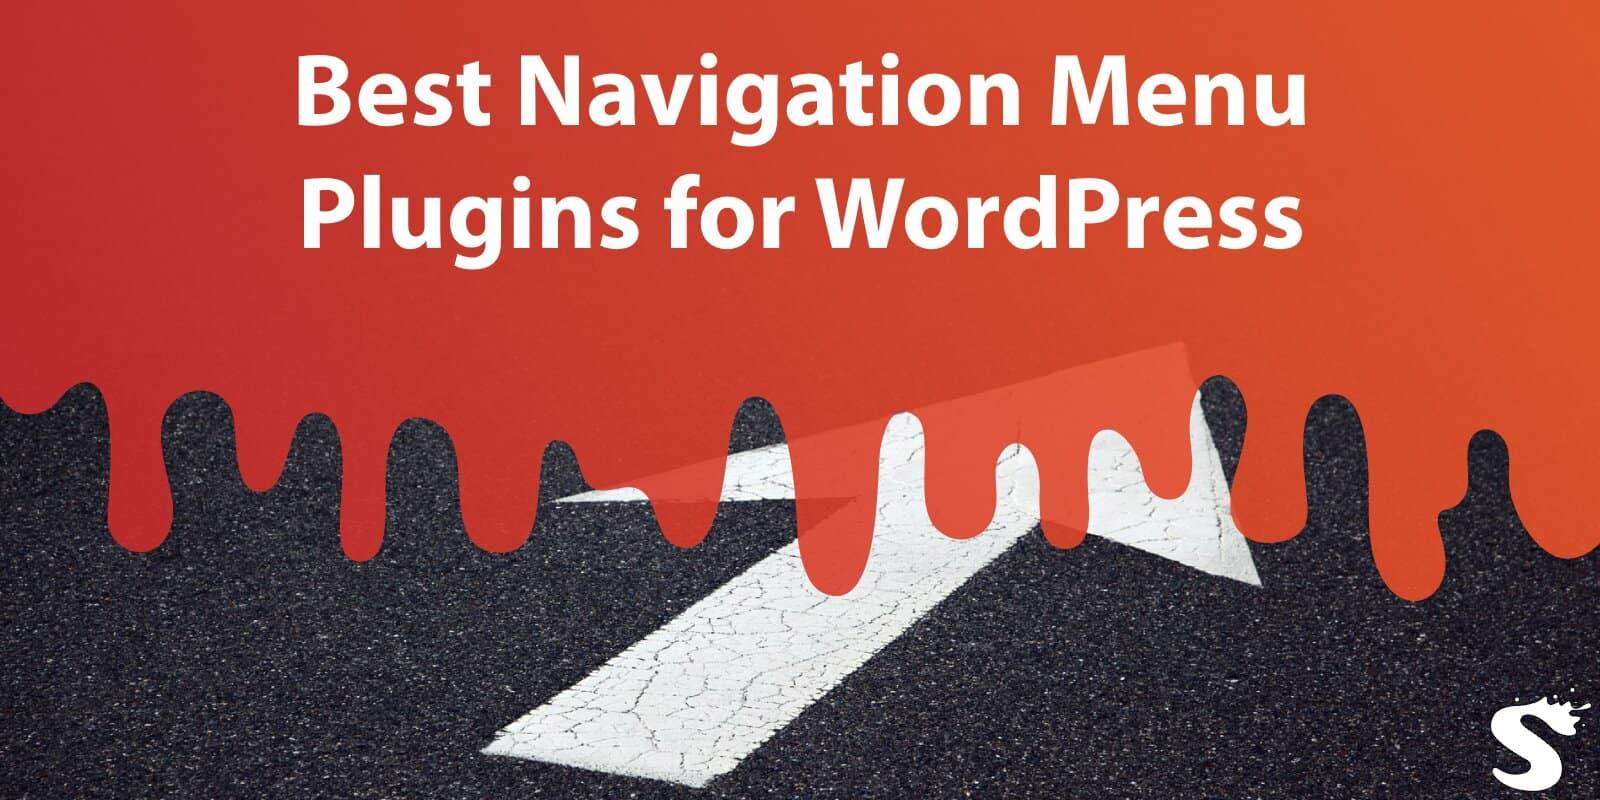 Best Navigation Menu Plugins for Wordpress